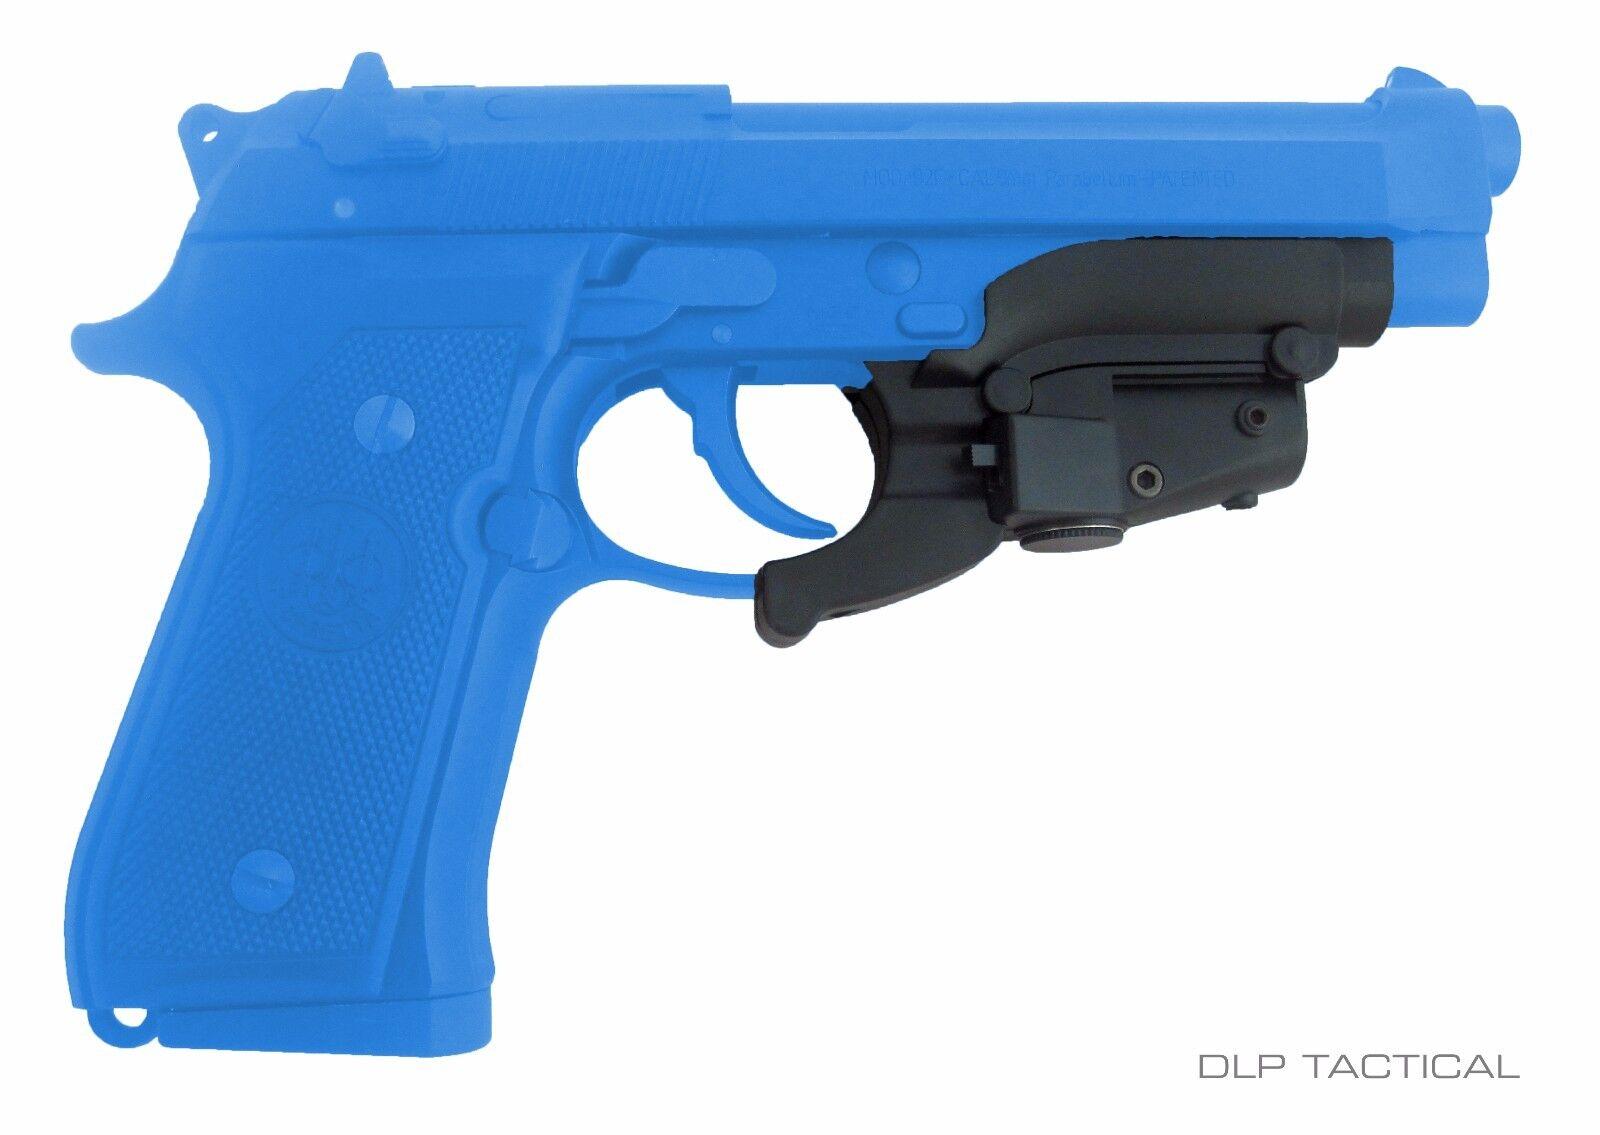 DLP Tactical mira láser para 92 96 M9 Beretta Model